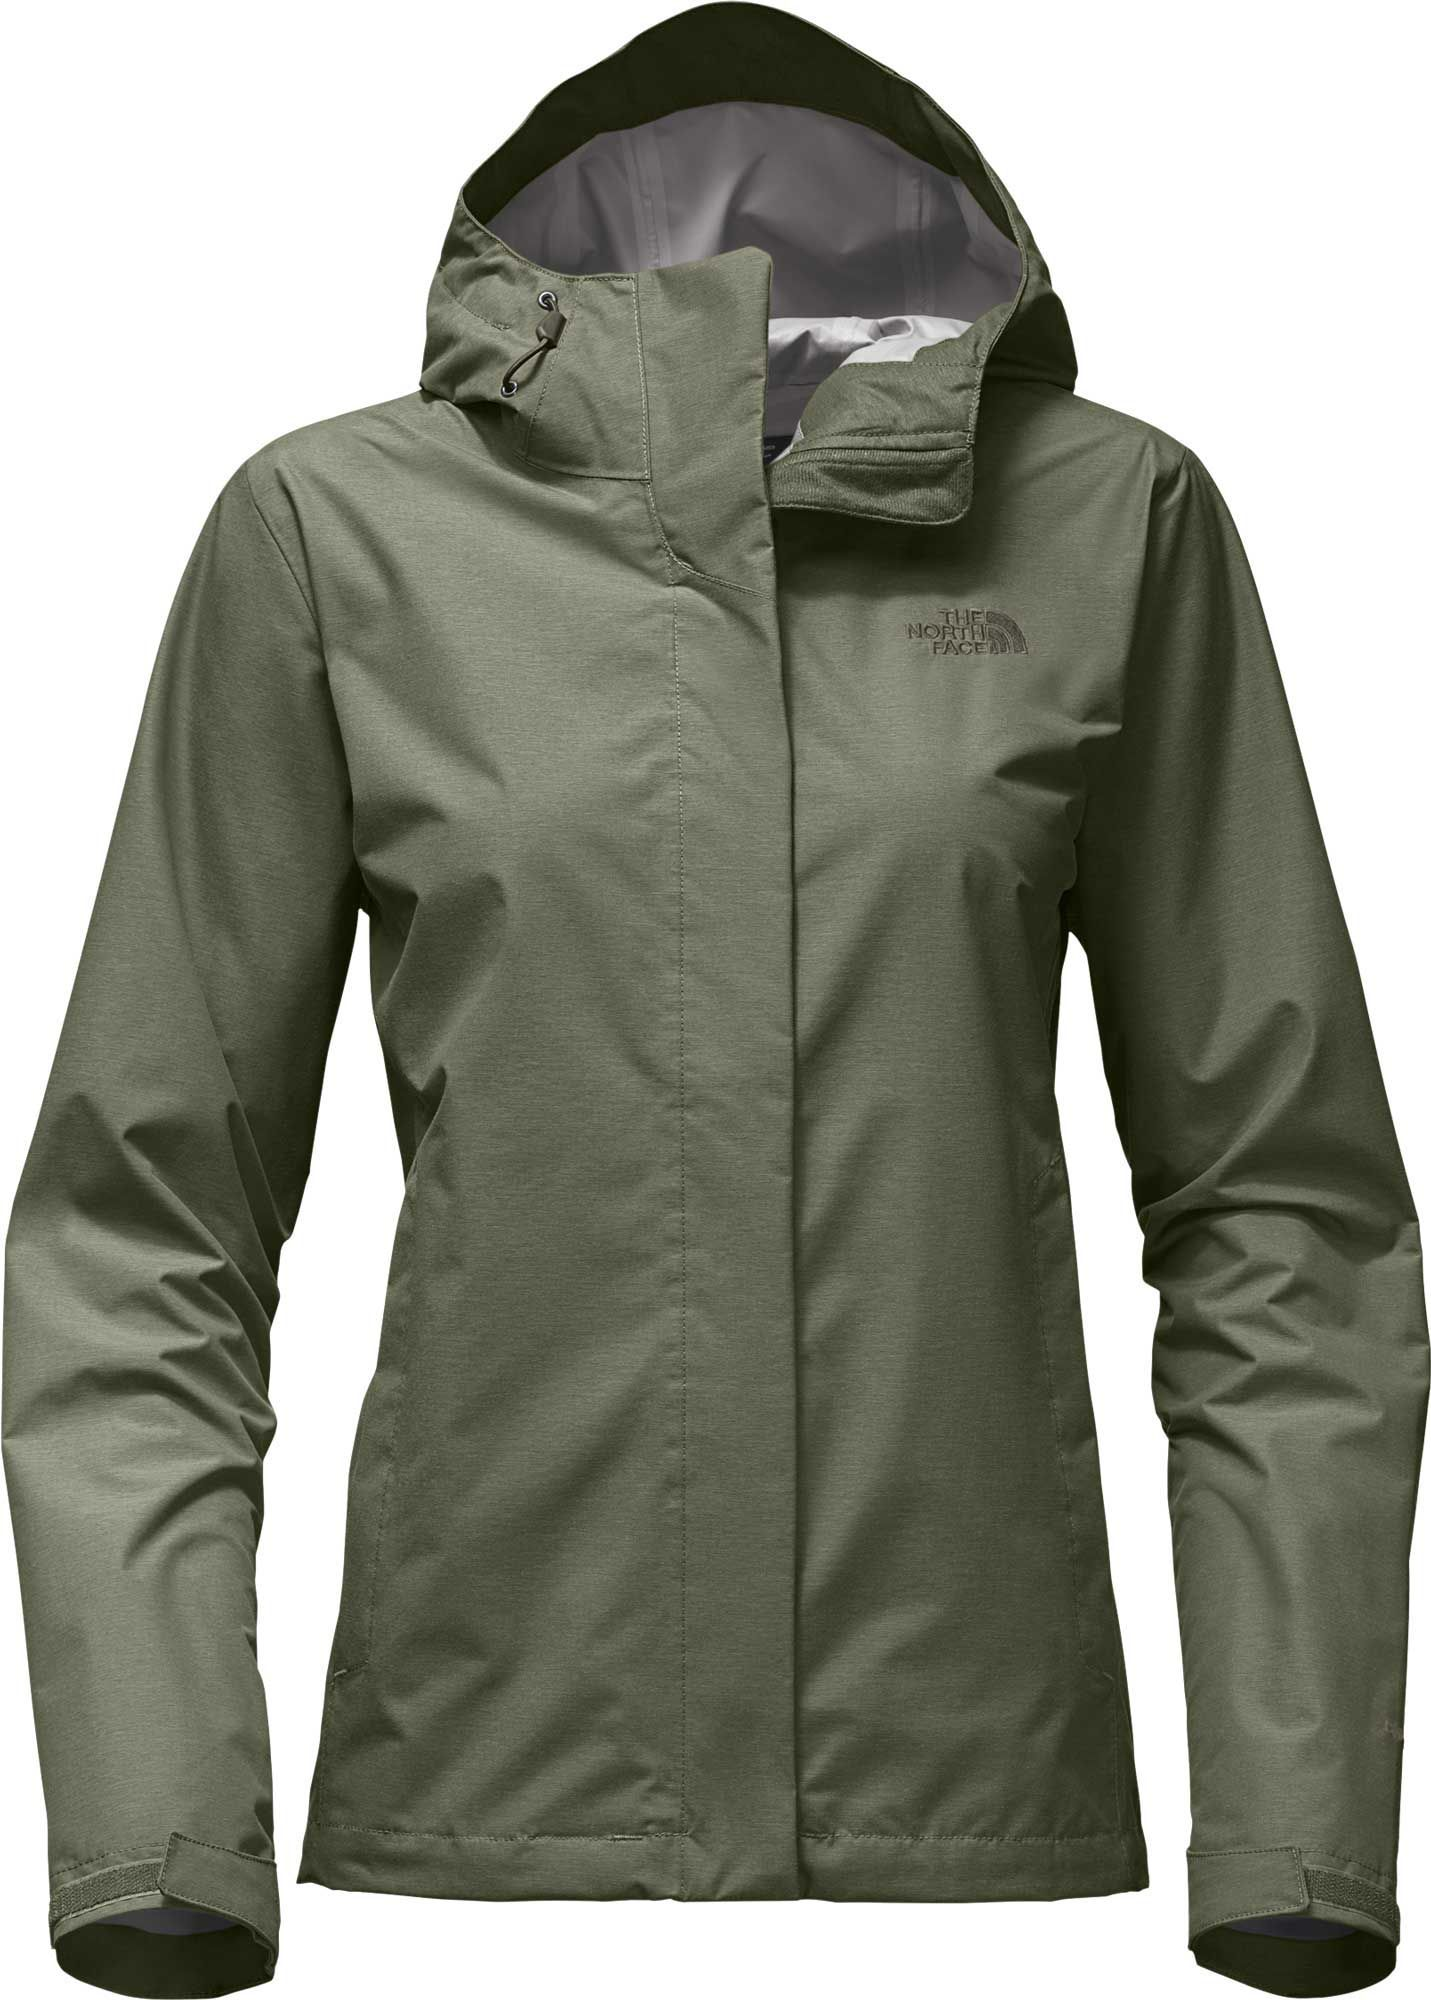 NEW THE NORTH FACE Cesium Anorak 12 Zip Jacket Men's L